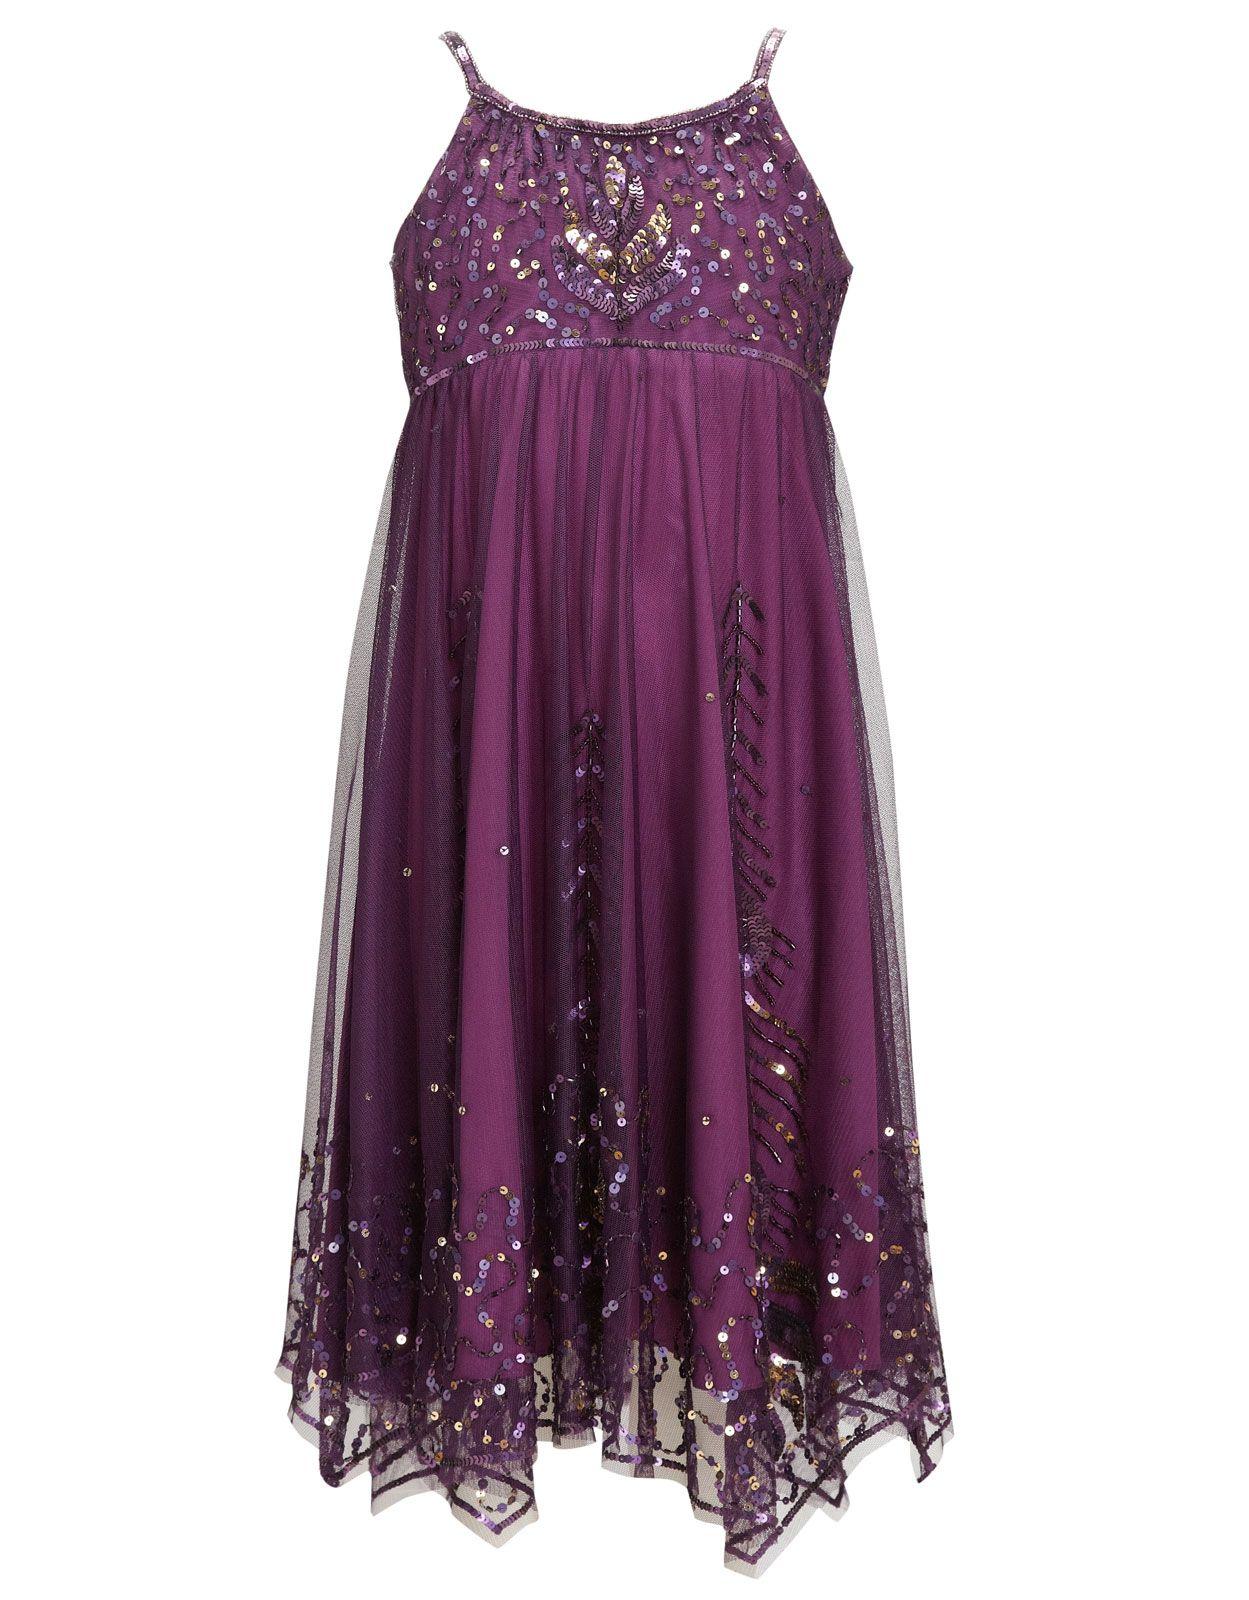 MONSOON -- party dress for Chloe maybe   Heiress   Pinterest